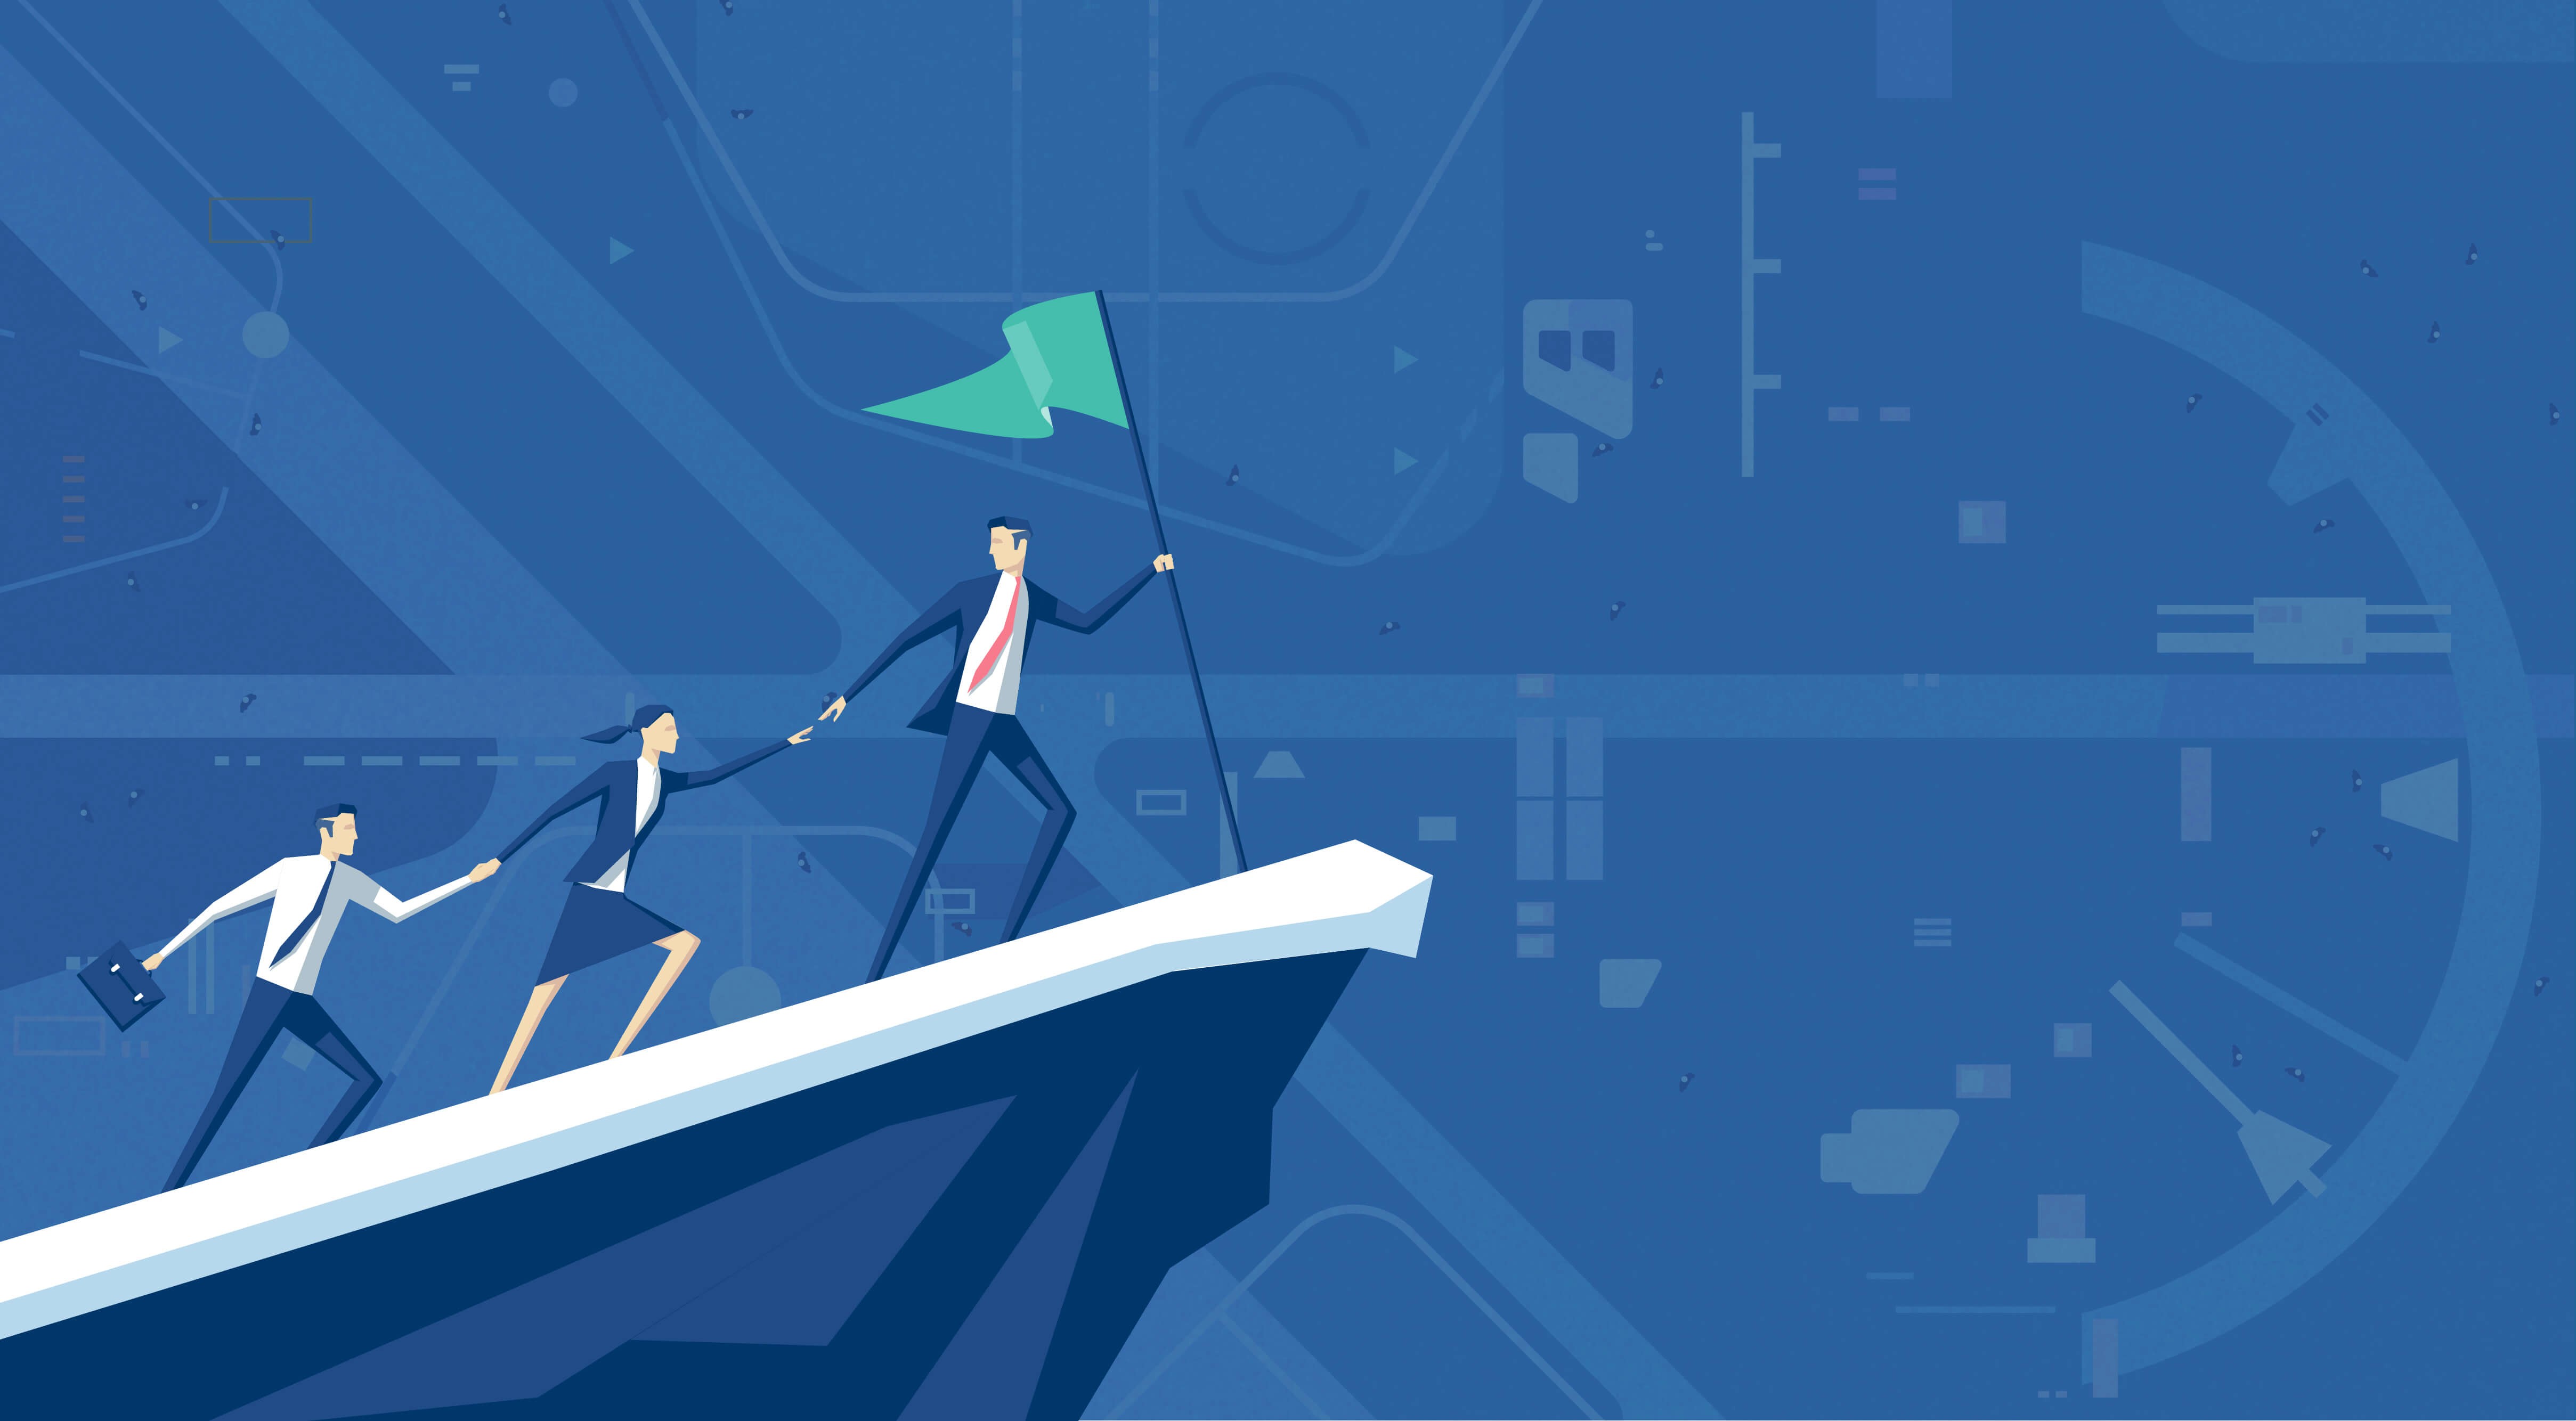 Unispace's leadership change strategies during COVID-19